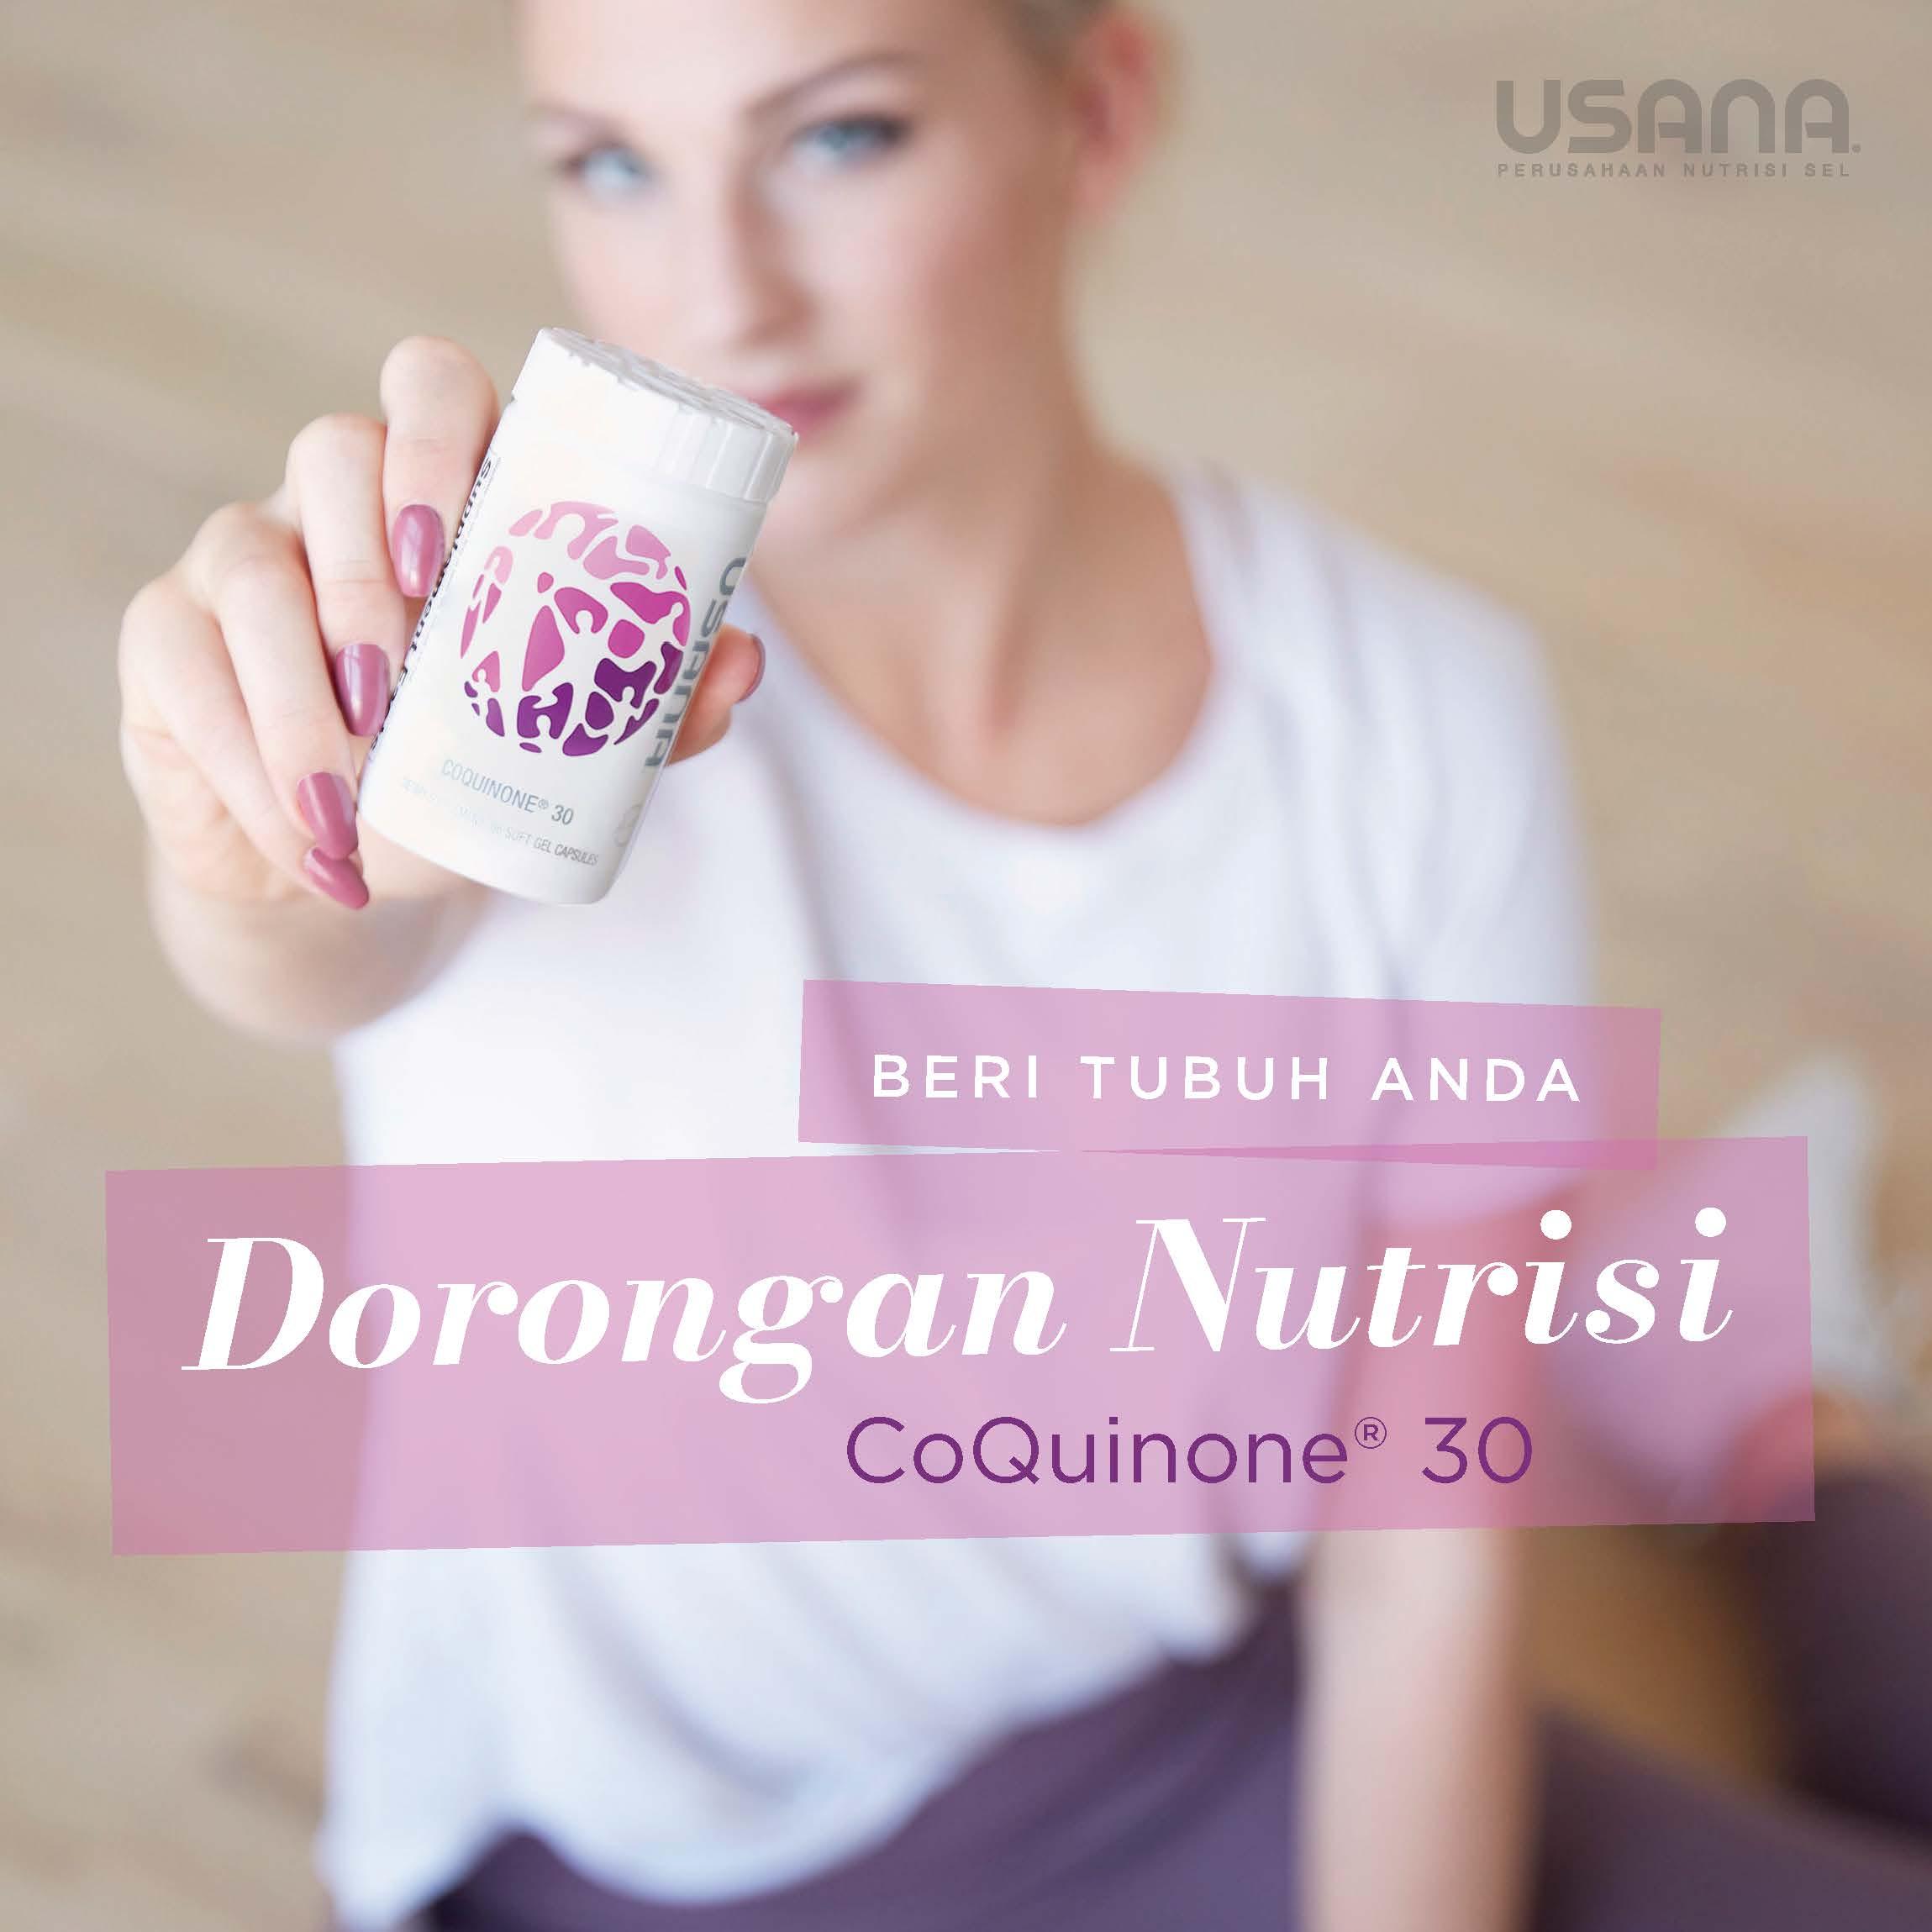 coquinone 30 usana indonesia